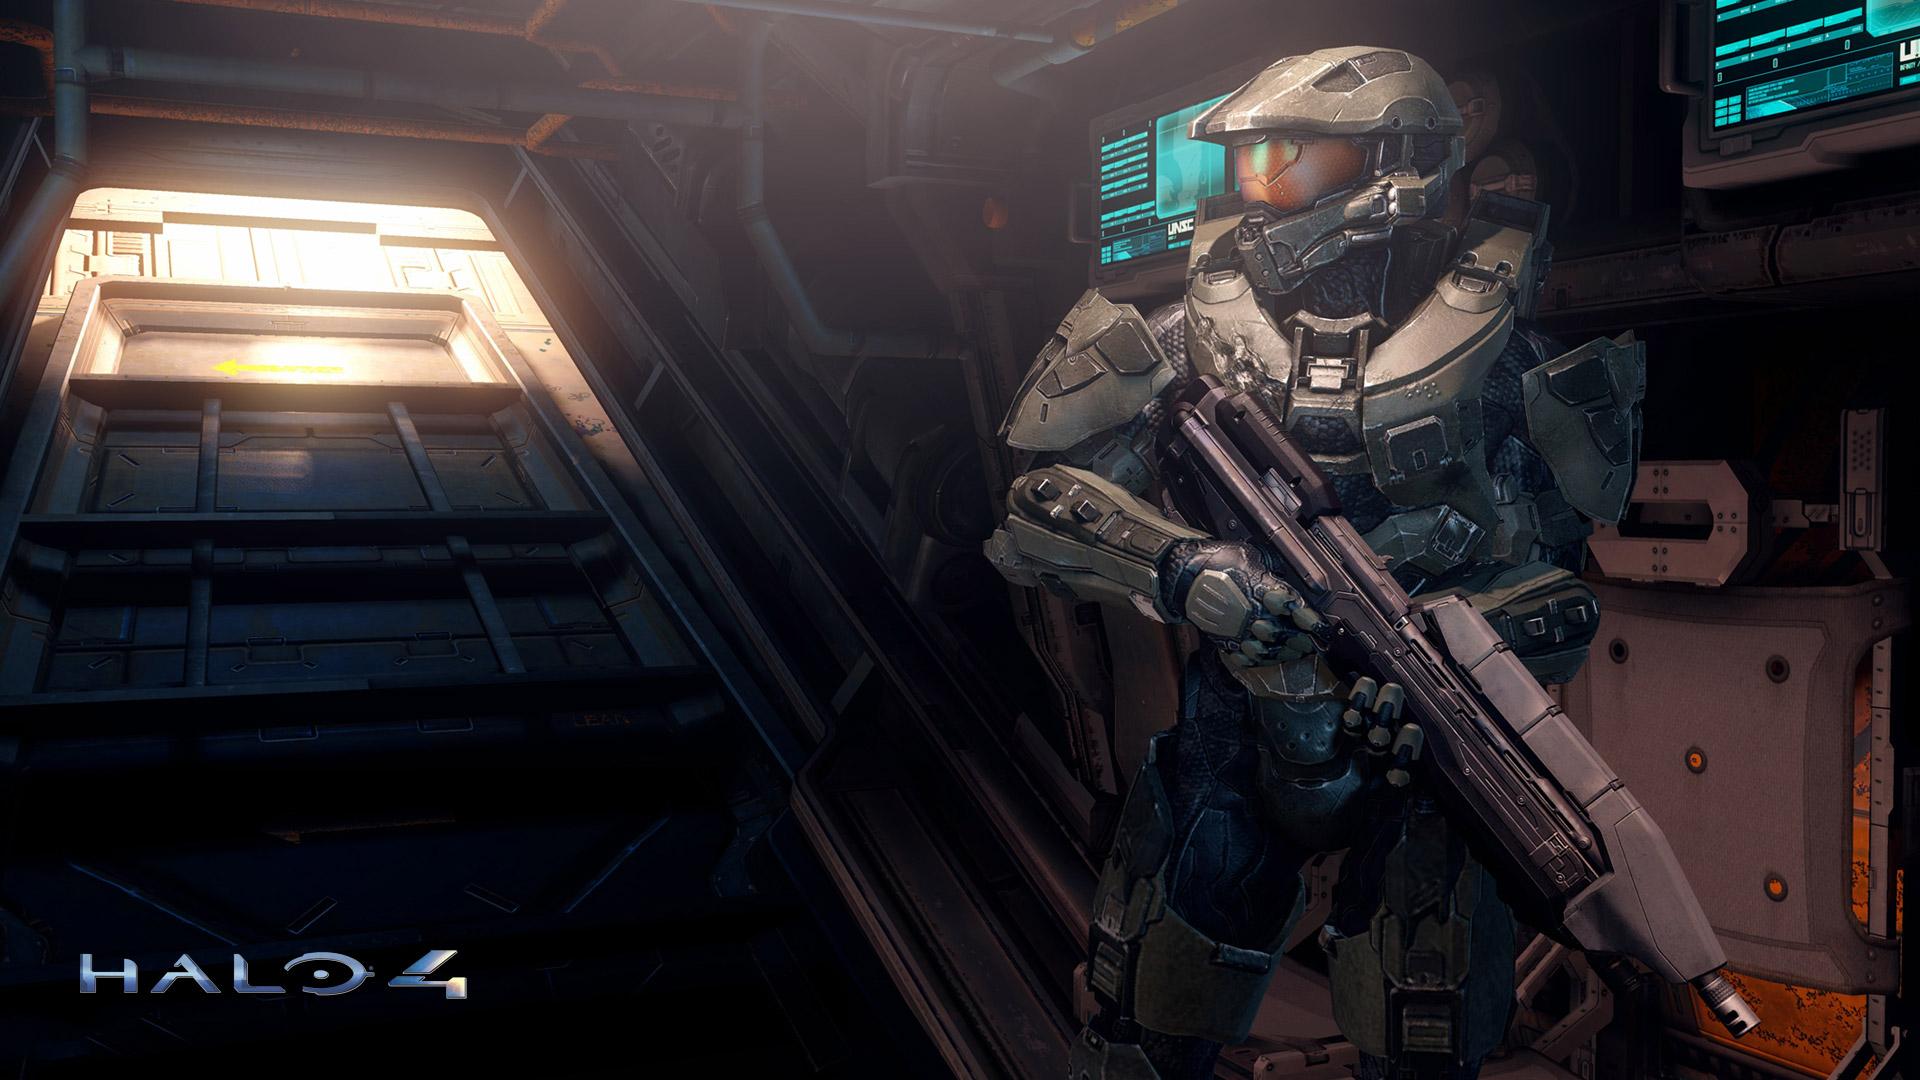 Halo 4 Wallpaper in 1920x1080